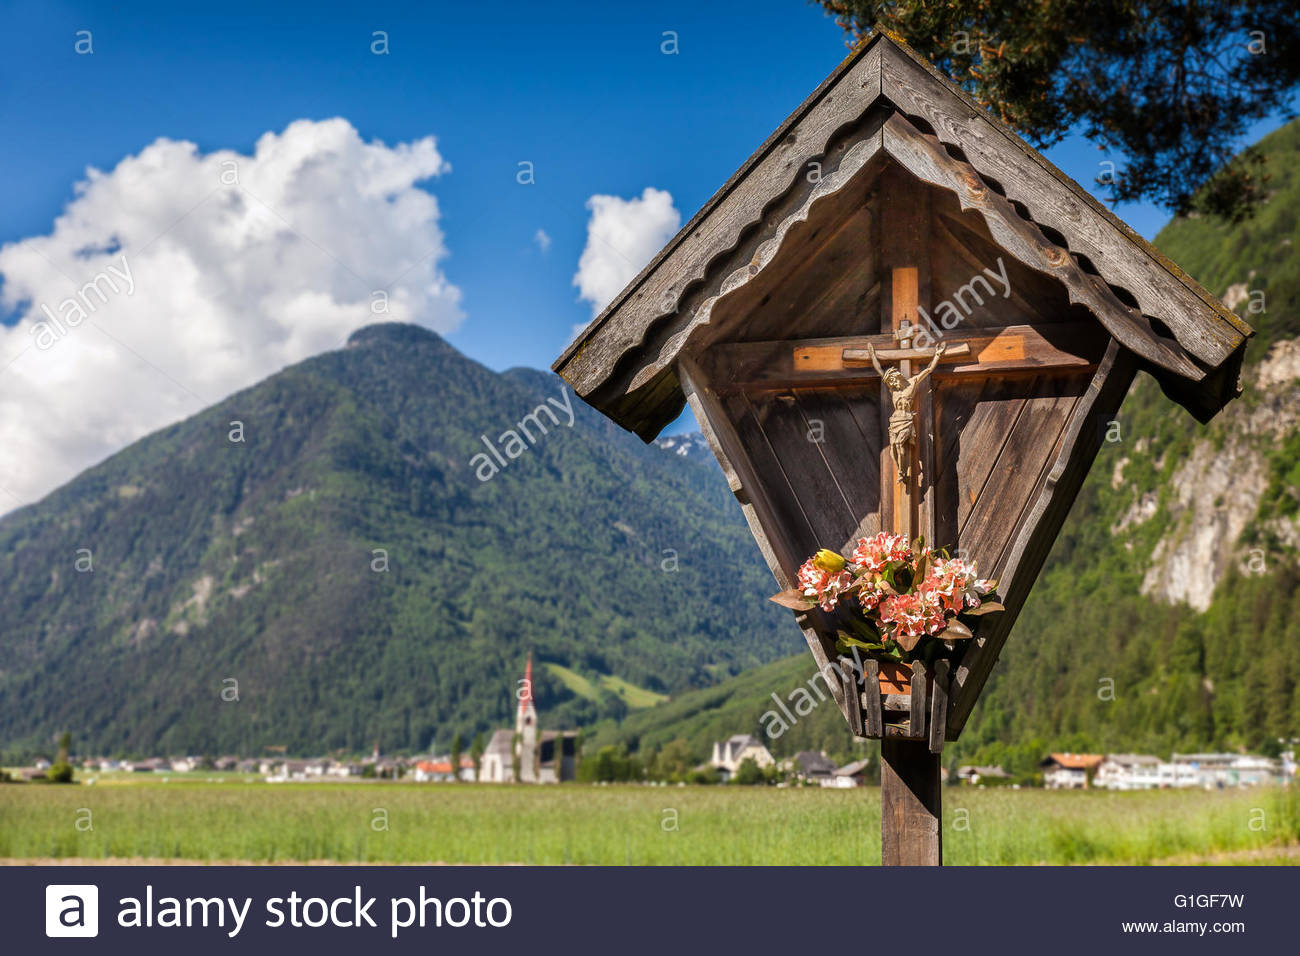 Christlichen Bildstock in Taufers, Südtirol, Italien Stockbild